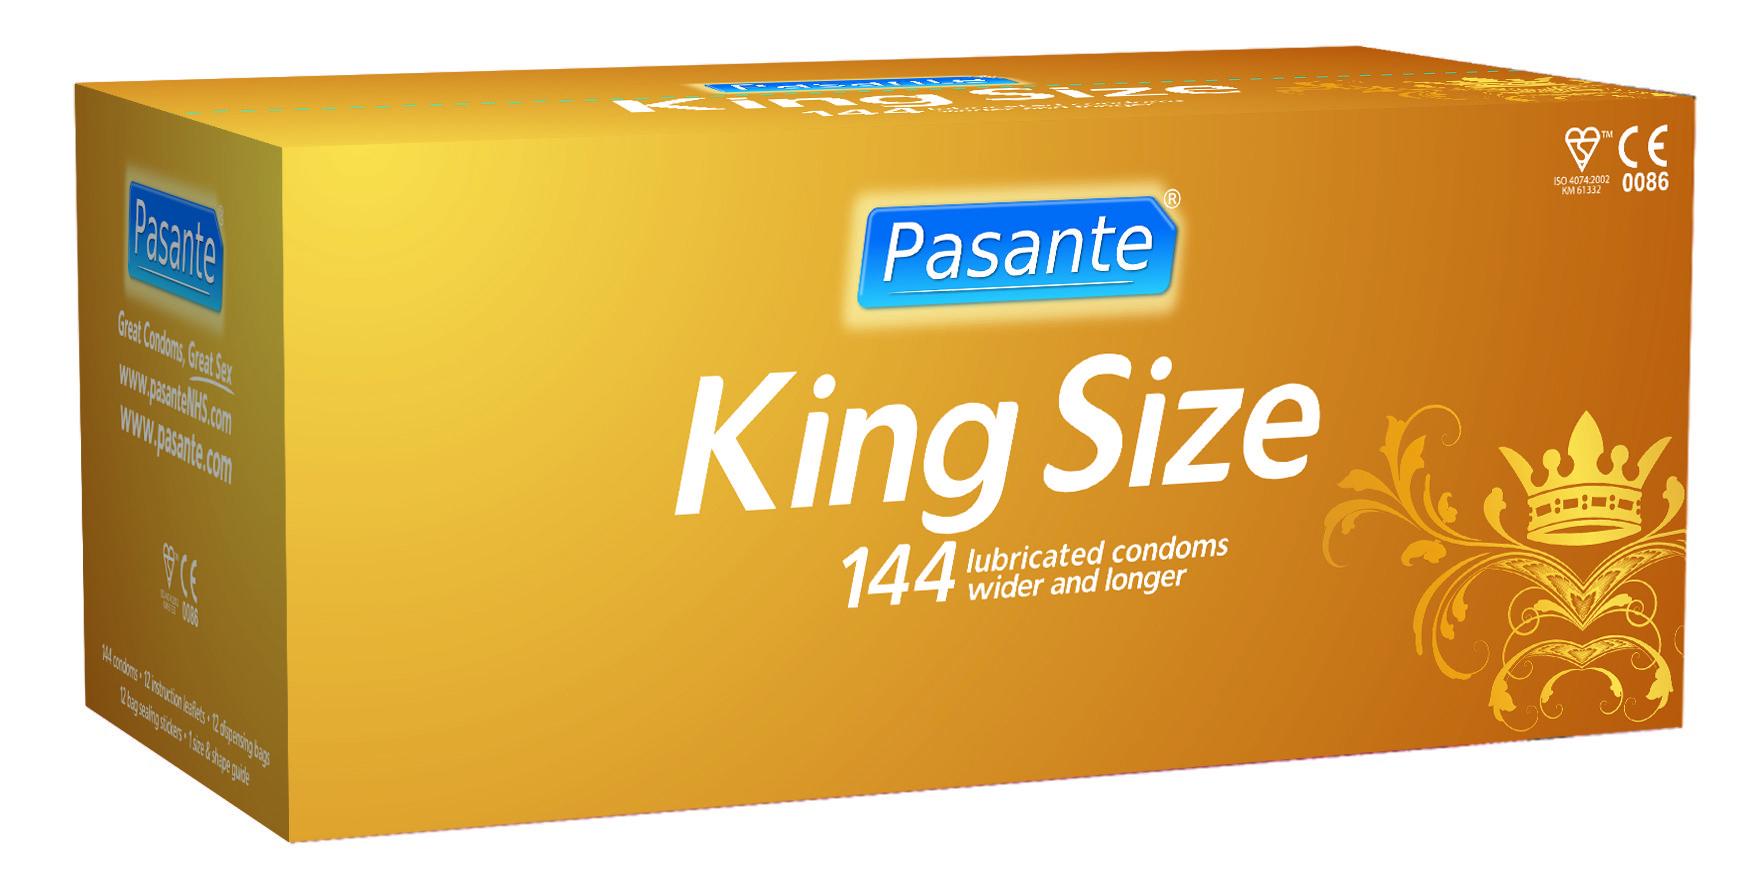 Pasante king size condoms, bulk pack (pack of 144)